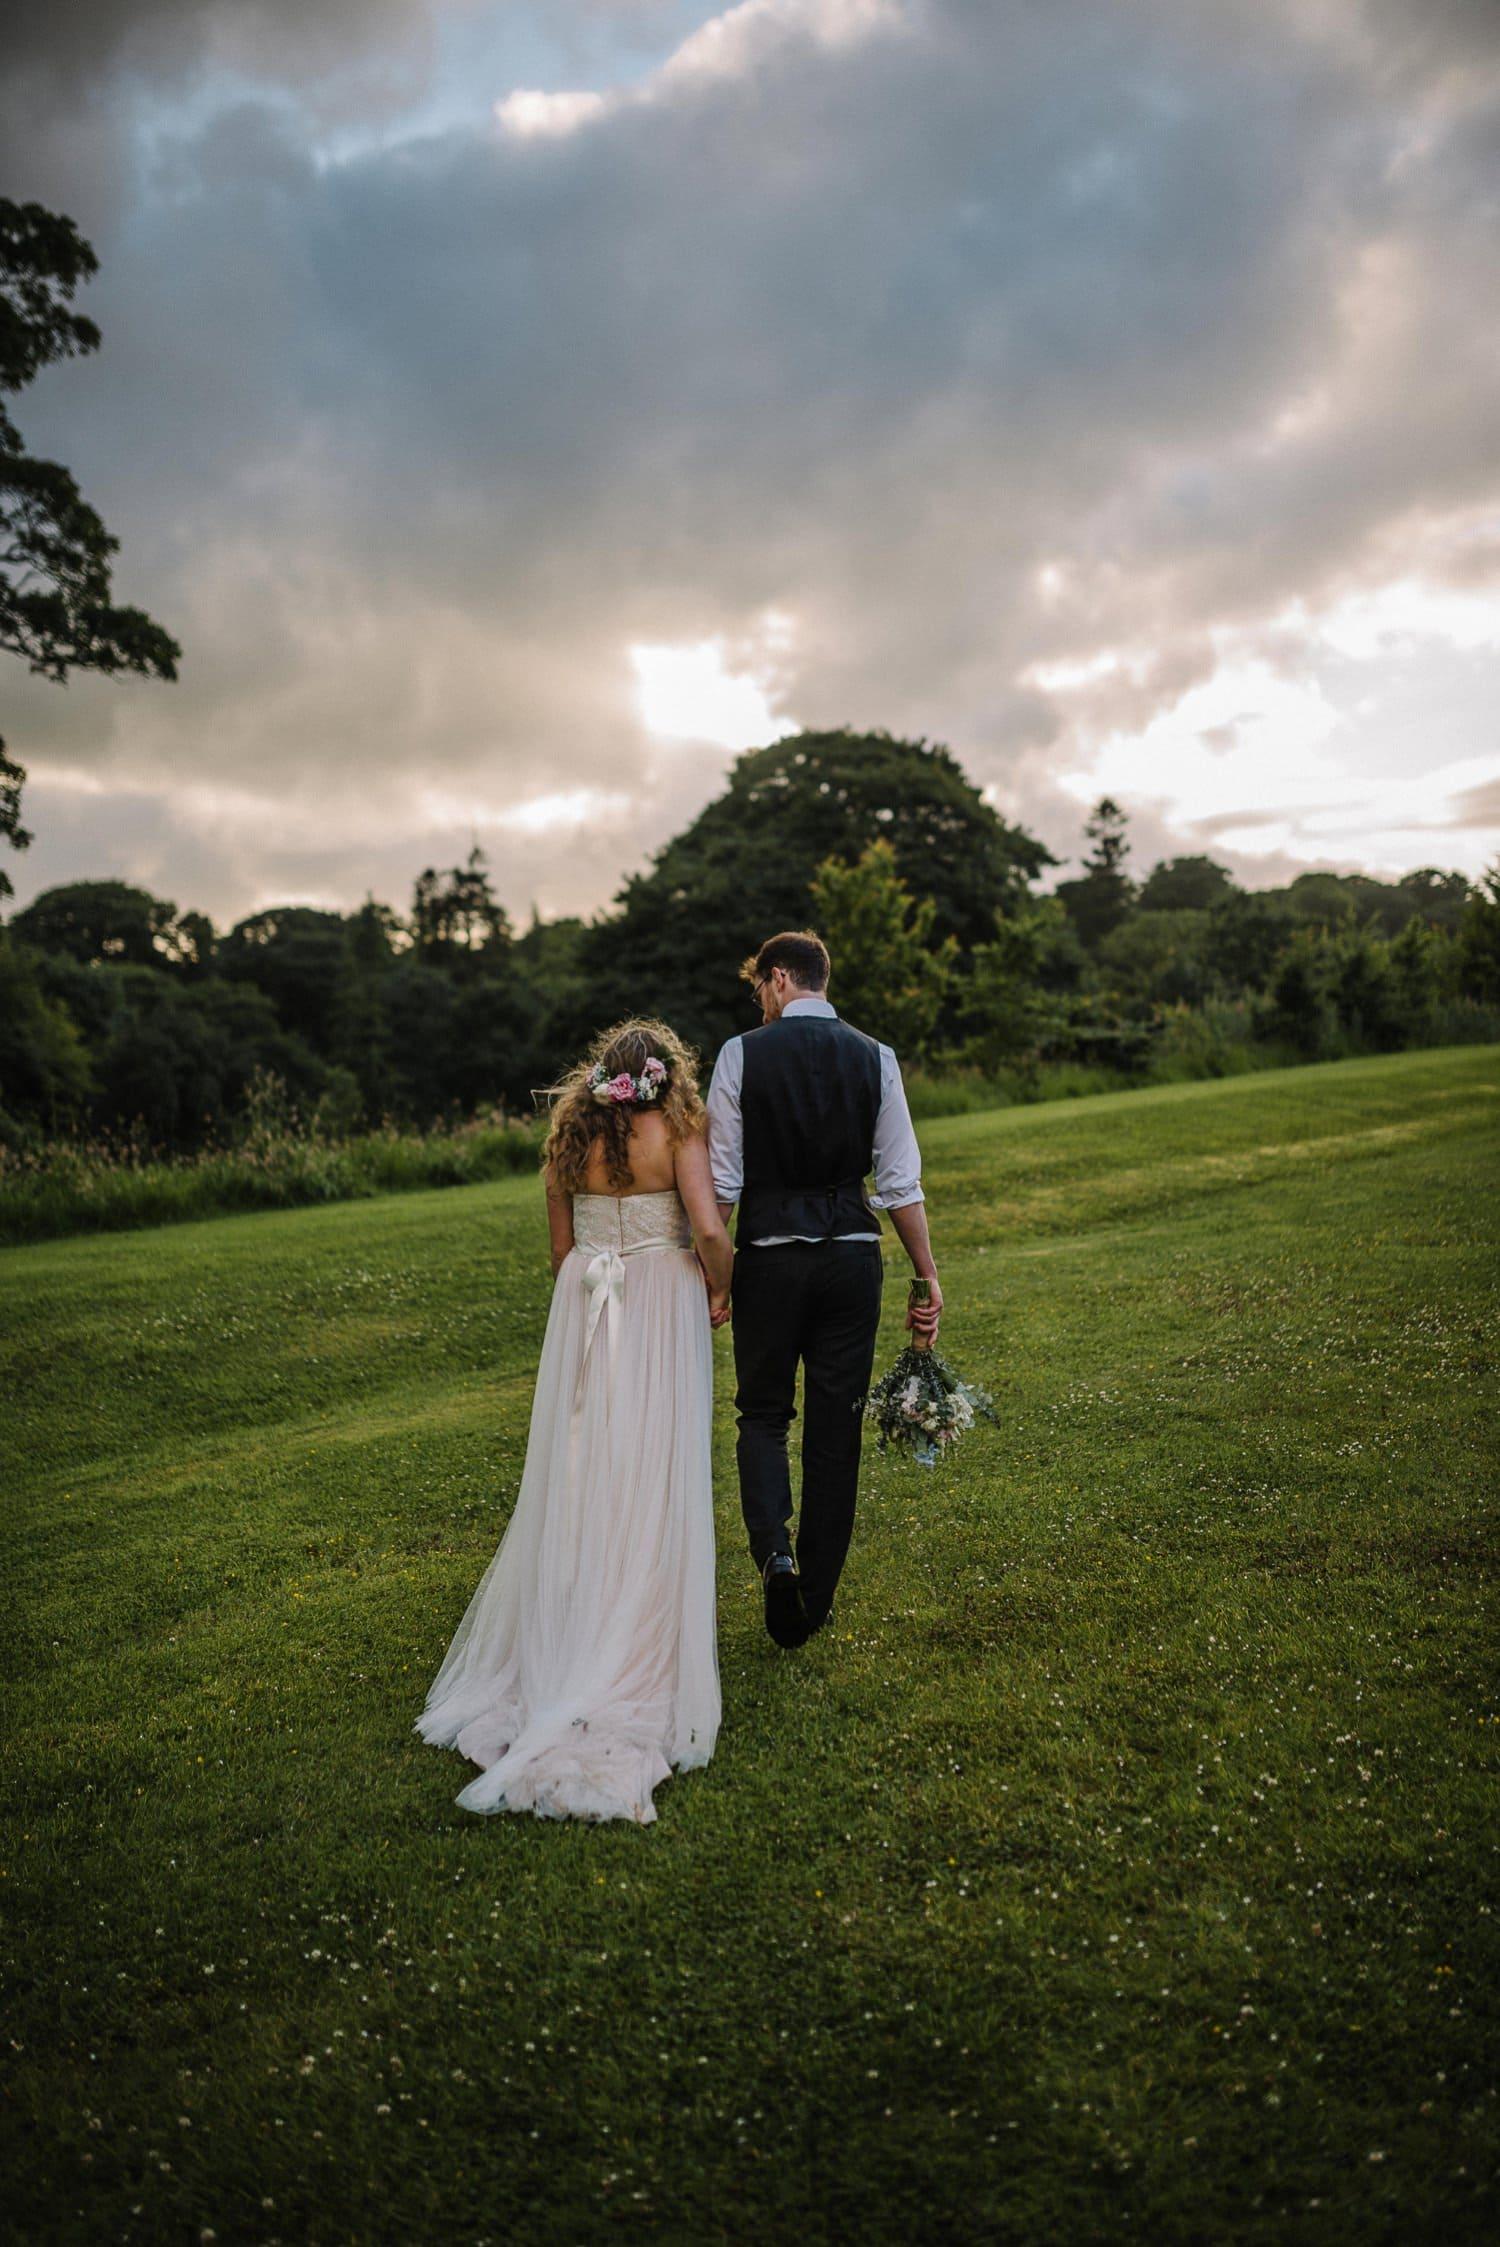 Lissanoure Castle wedding Photographer Northern Ireland_0128.jpg